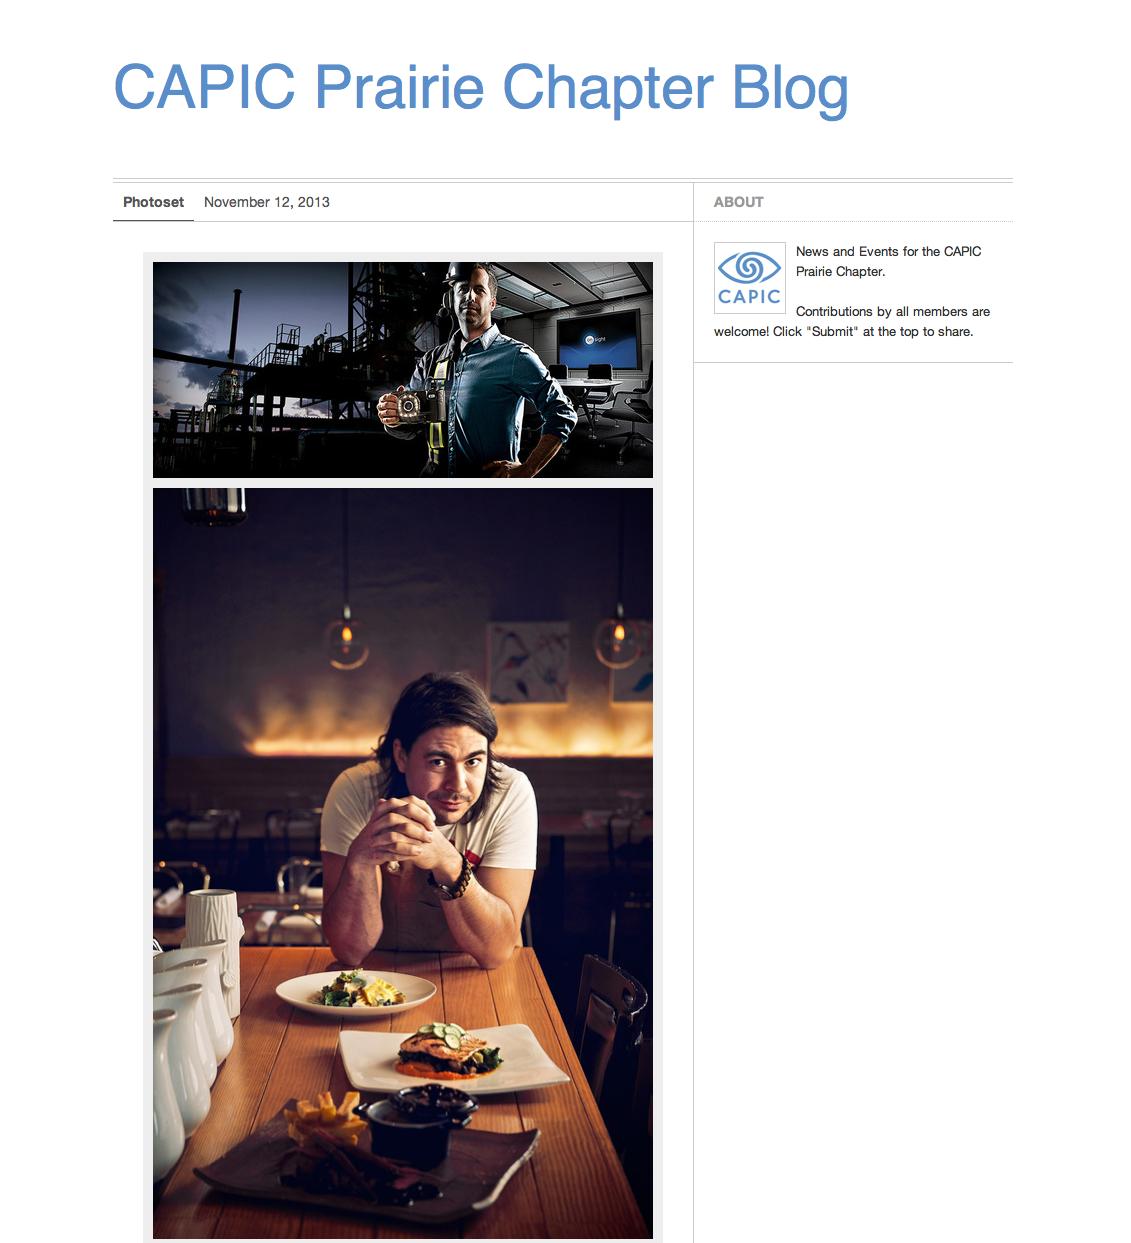 CAPIC Profile